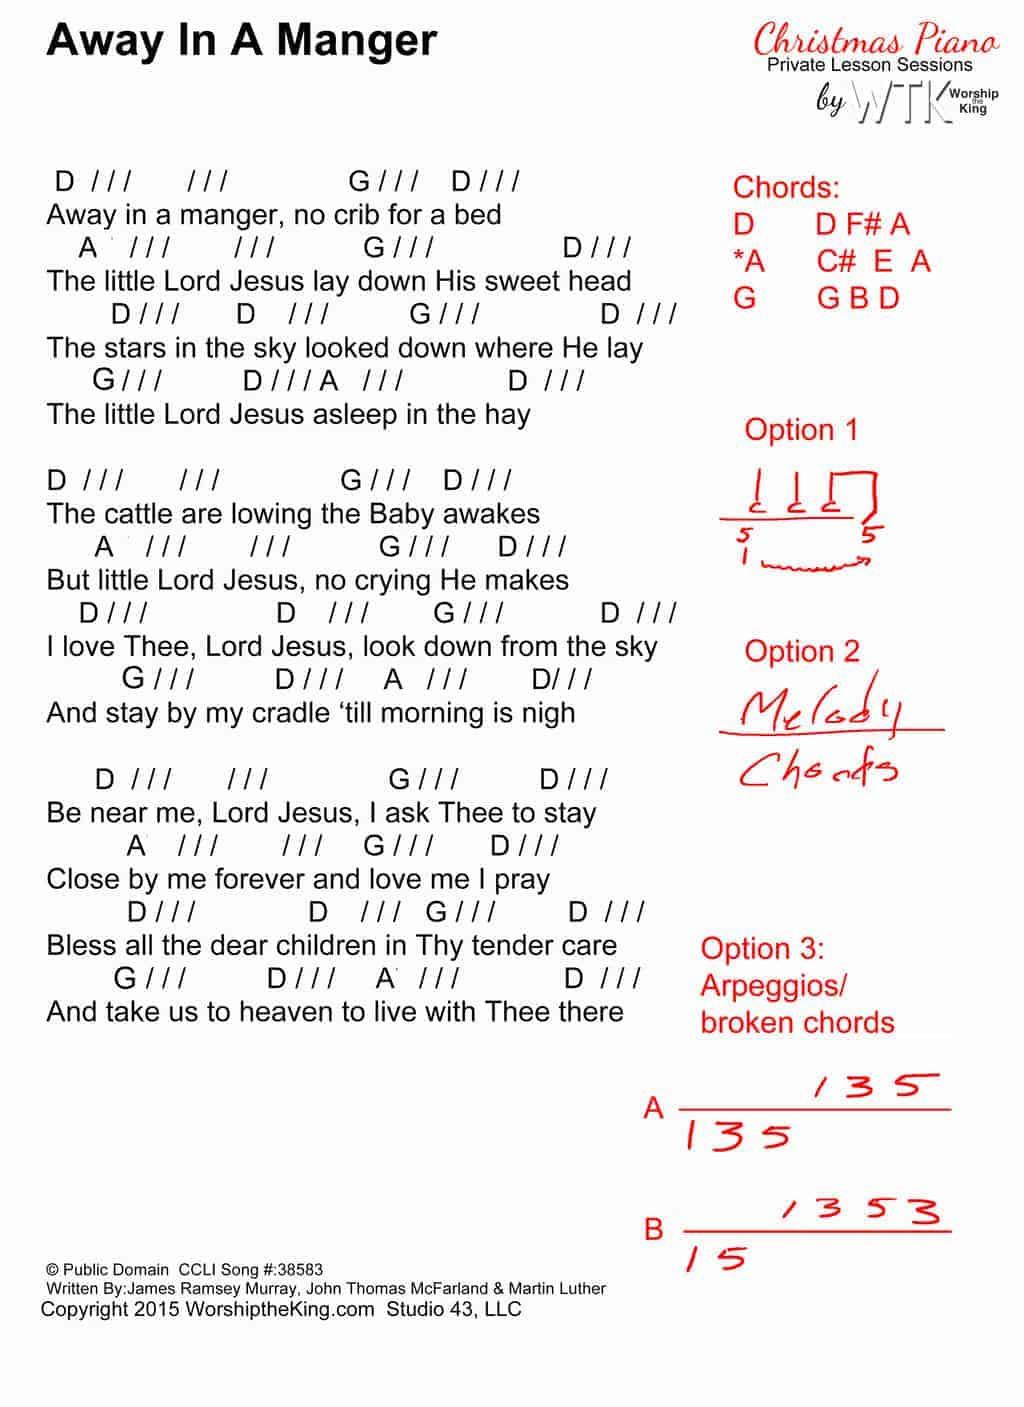 Microsoft Word - guitarsongbook-3rdedition.doc